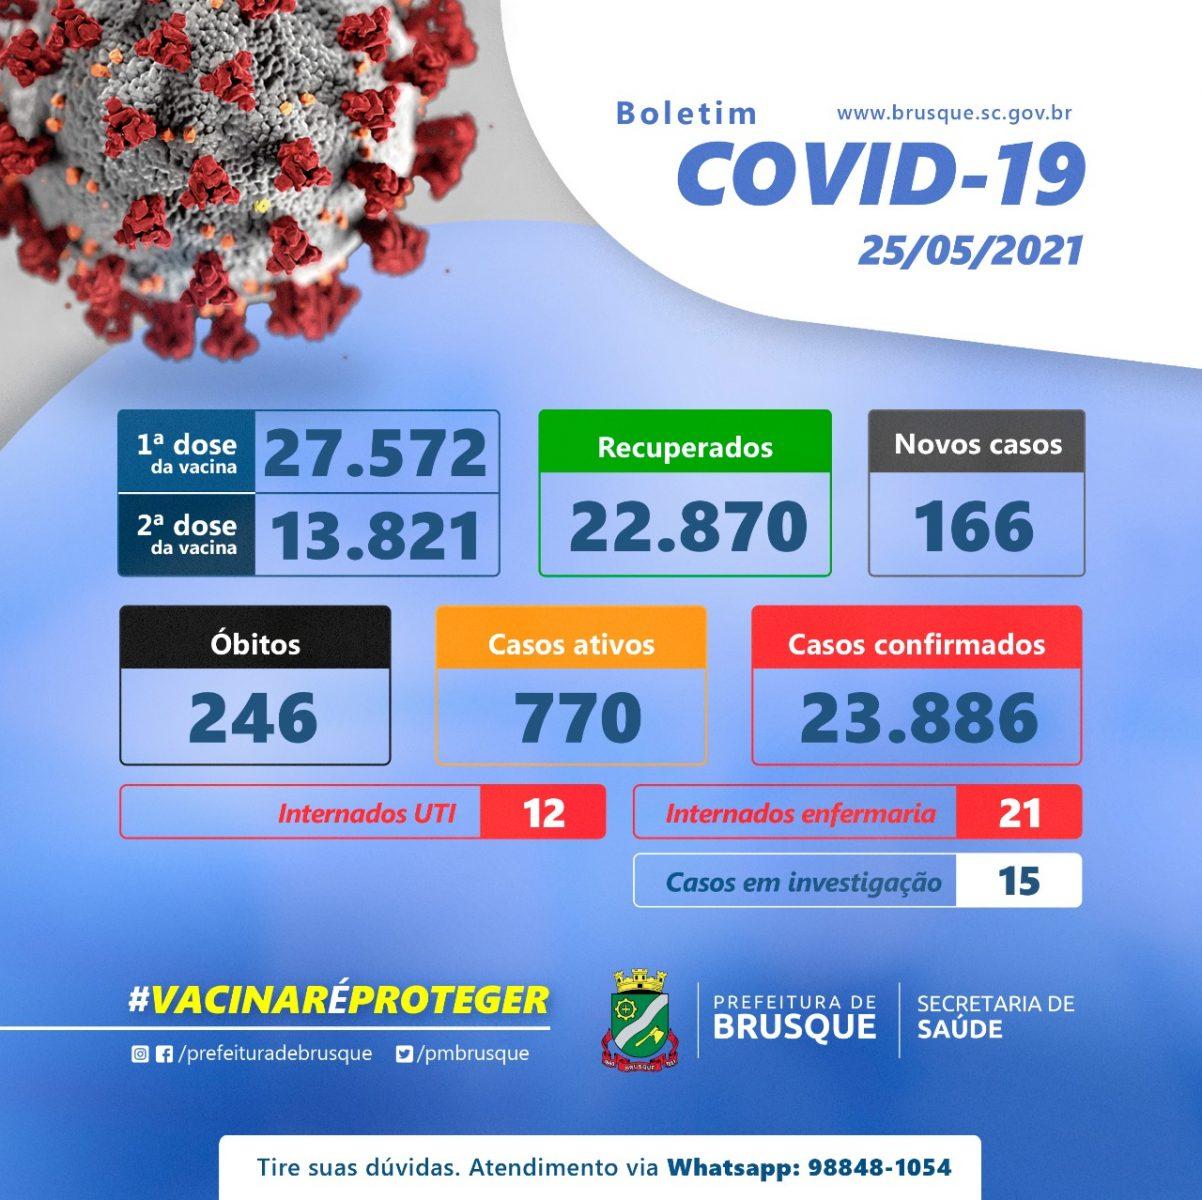 Covid-19: Confira o boletim epidemiológico desta terça-feira (25)